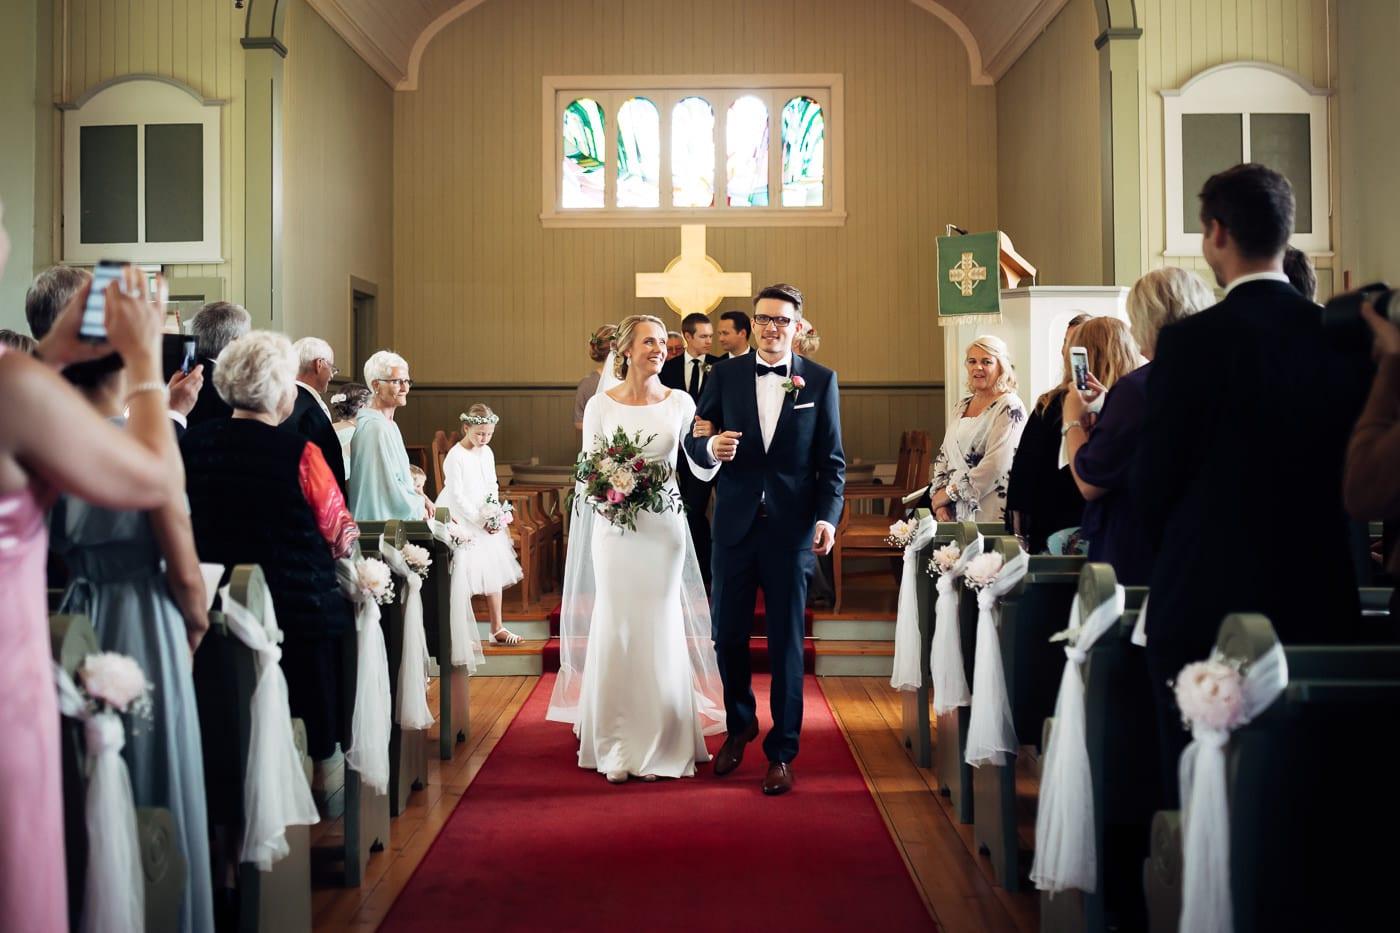 Karoline & Andreas - bryllup i Østfold med magiske detaljer Bryllup Fredrikstad Fotograf 29